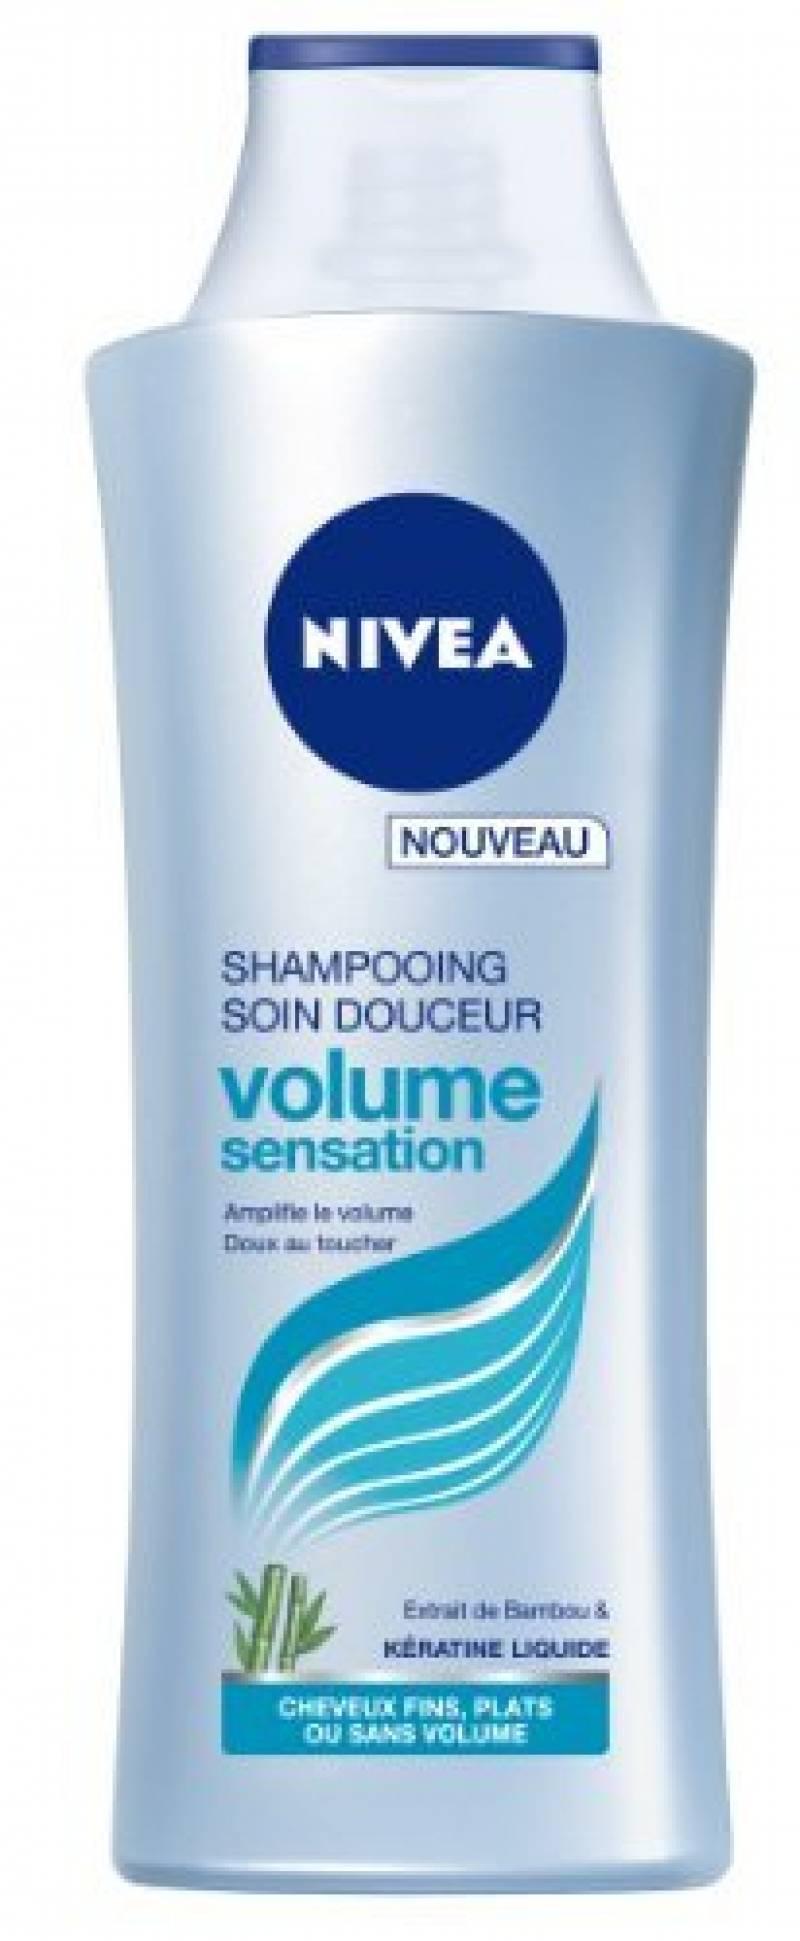 Nivea Shampooing Volume Sensation 400 ml de la marque NIVEA TOP 1 image 0 produit